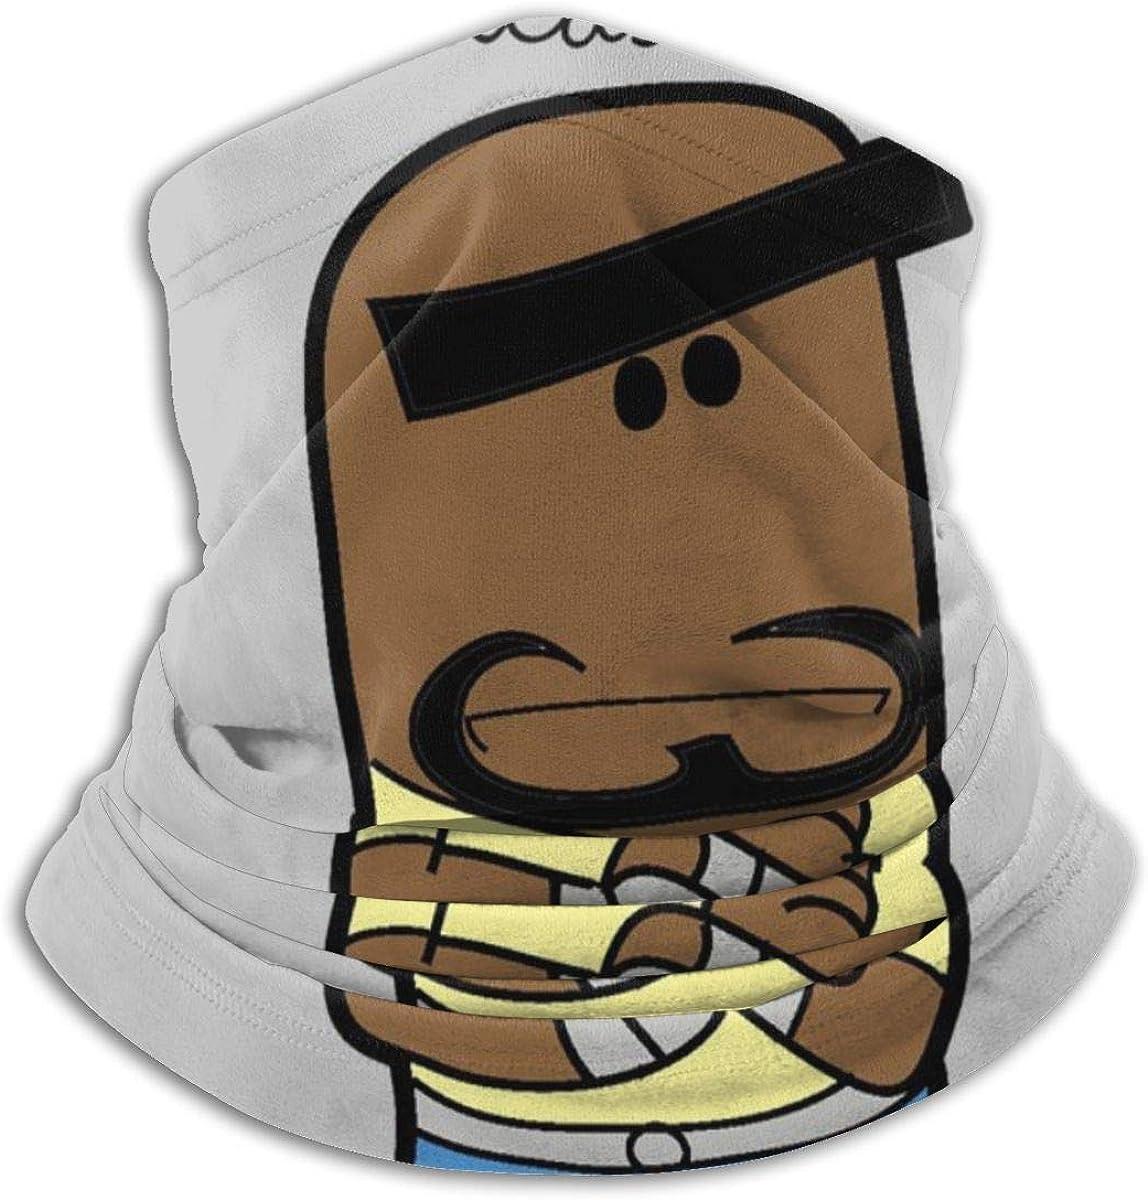 hisuyibaihuo Mr Cage by Lucas Cage Hero for Alquiler Face Bandanas para polvo, al aire libre, festivales, deportes